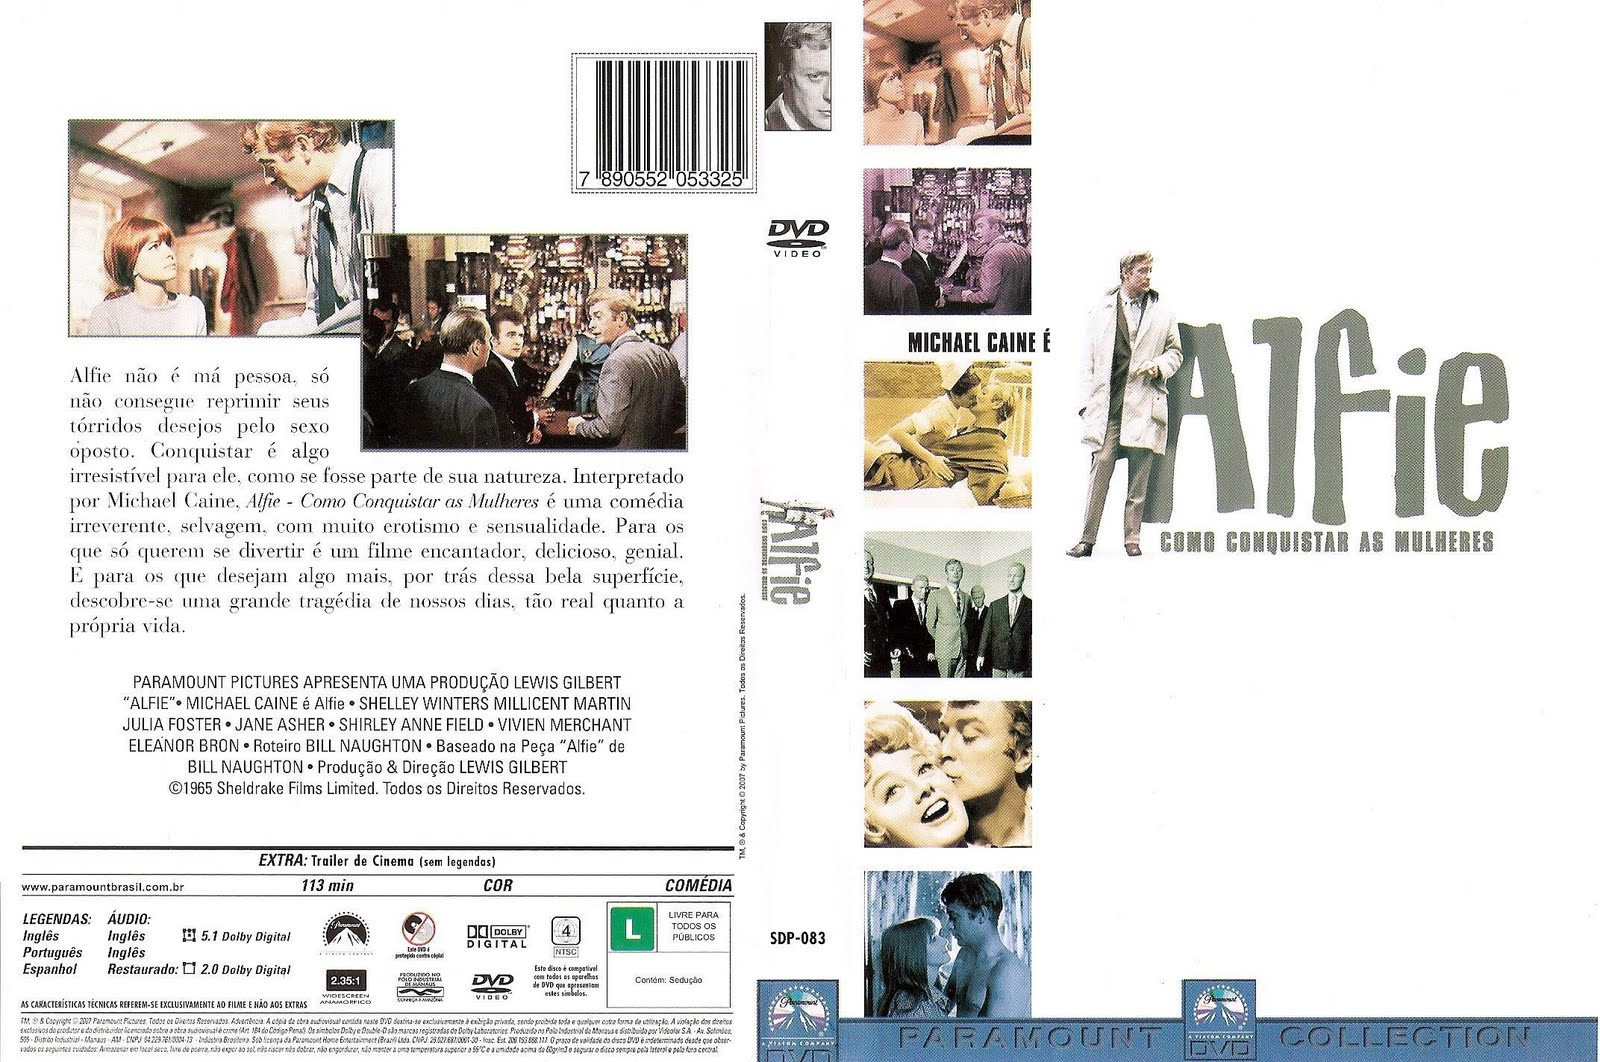 http://2.bp.blogspot.com/_avx0CDv74_c/TCo-HI65dCI/AAAAAAAAAB8/AKg2ceOlkpI/s1600/Alfie+Como+Conquistar+As+Mulheres.jpg